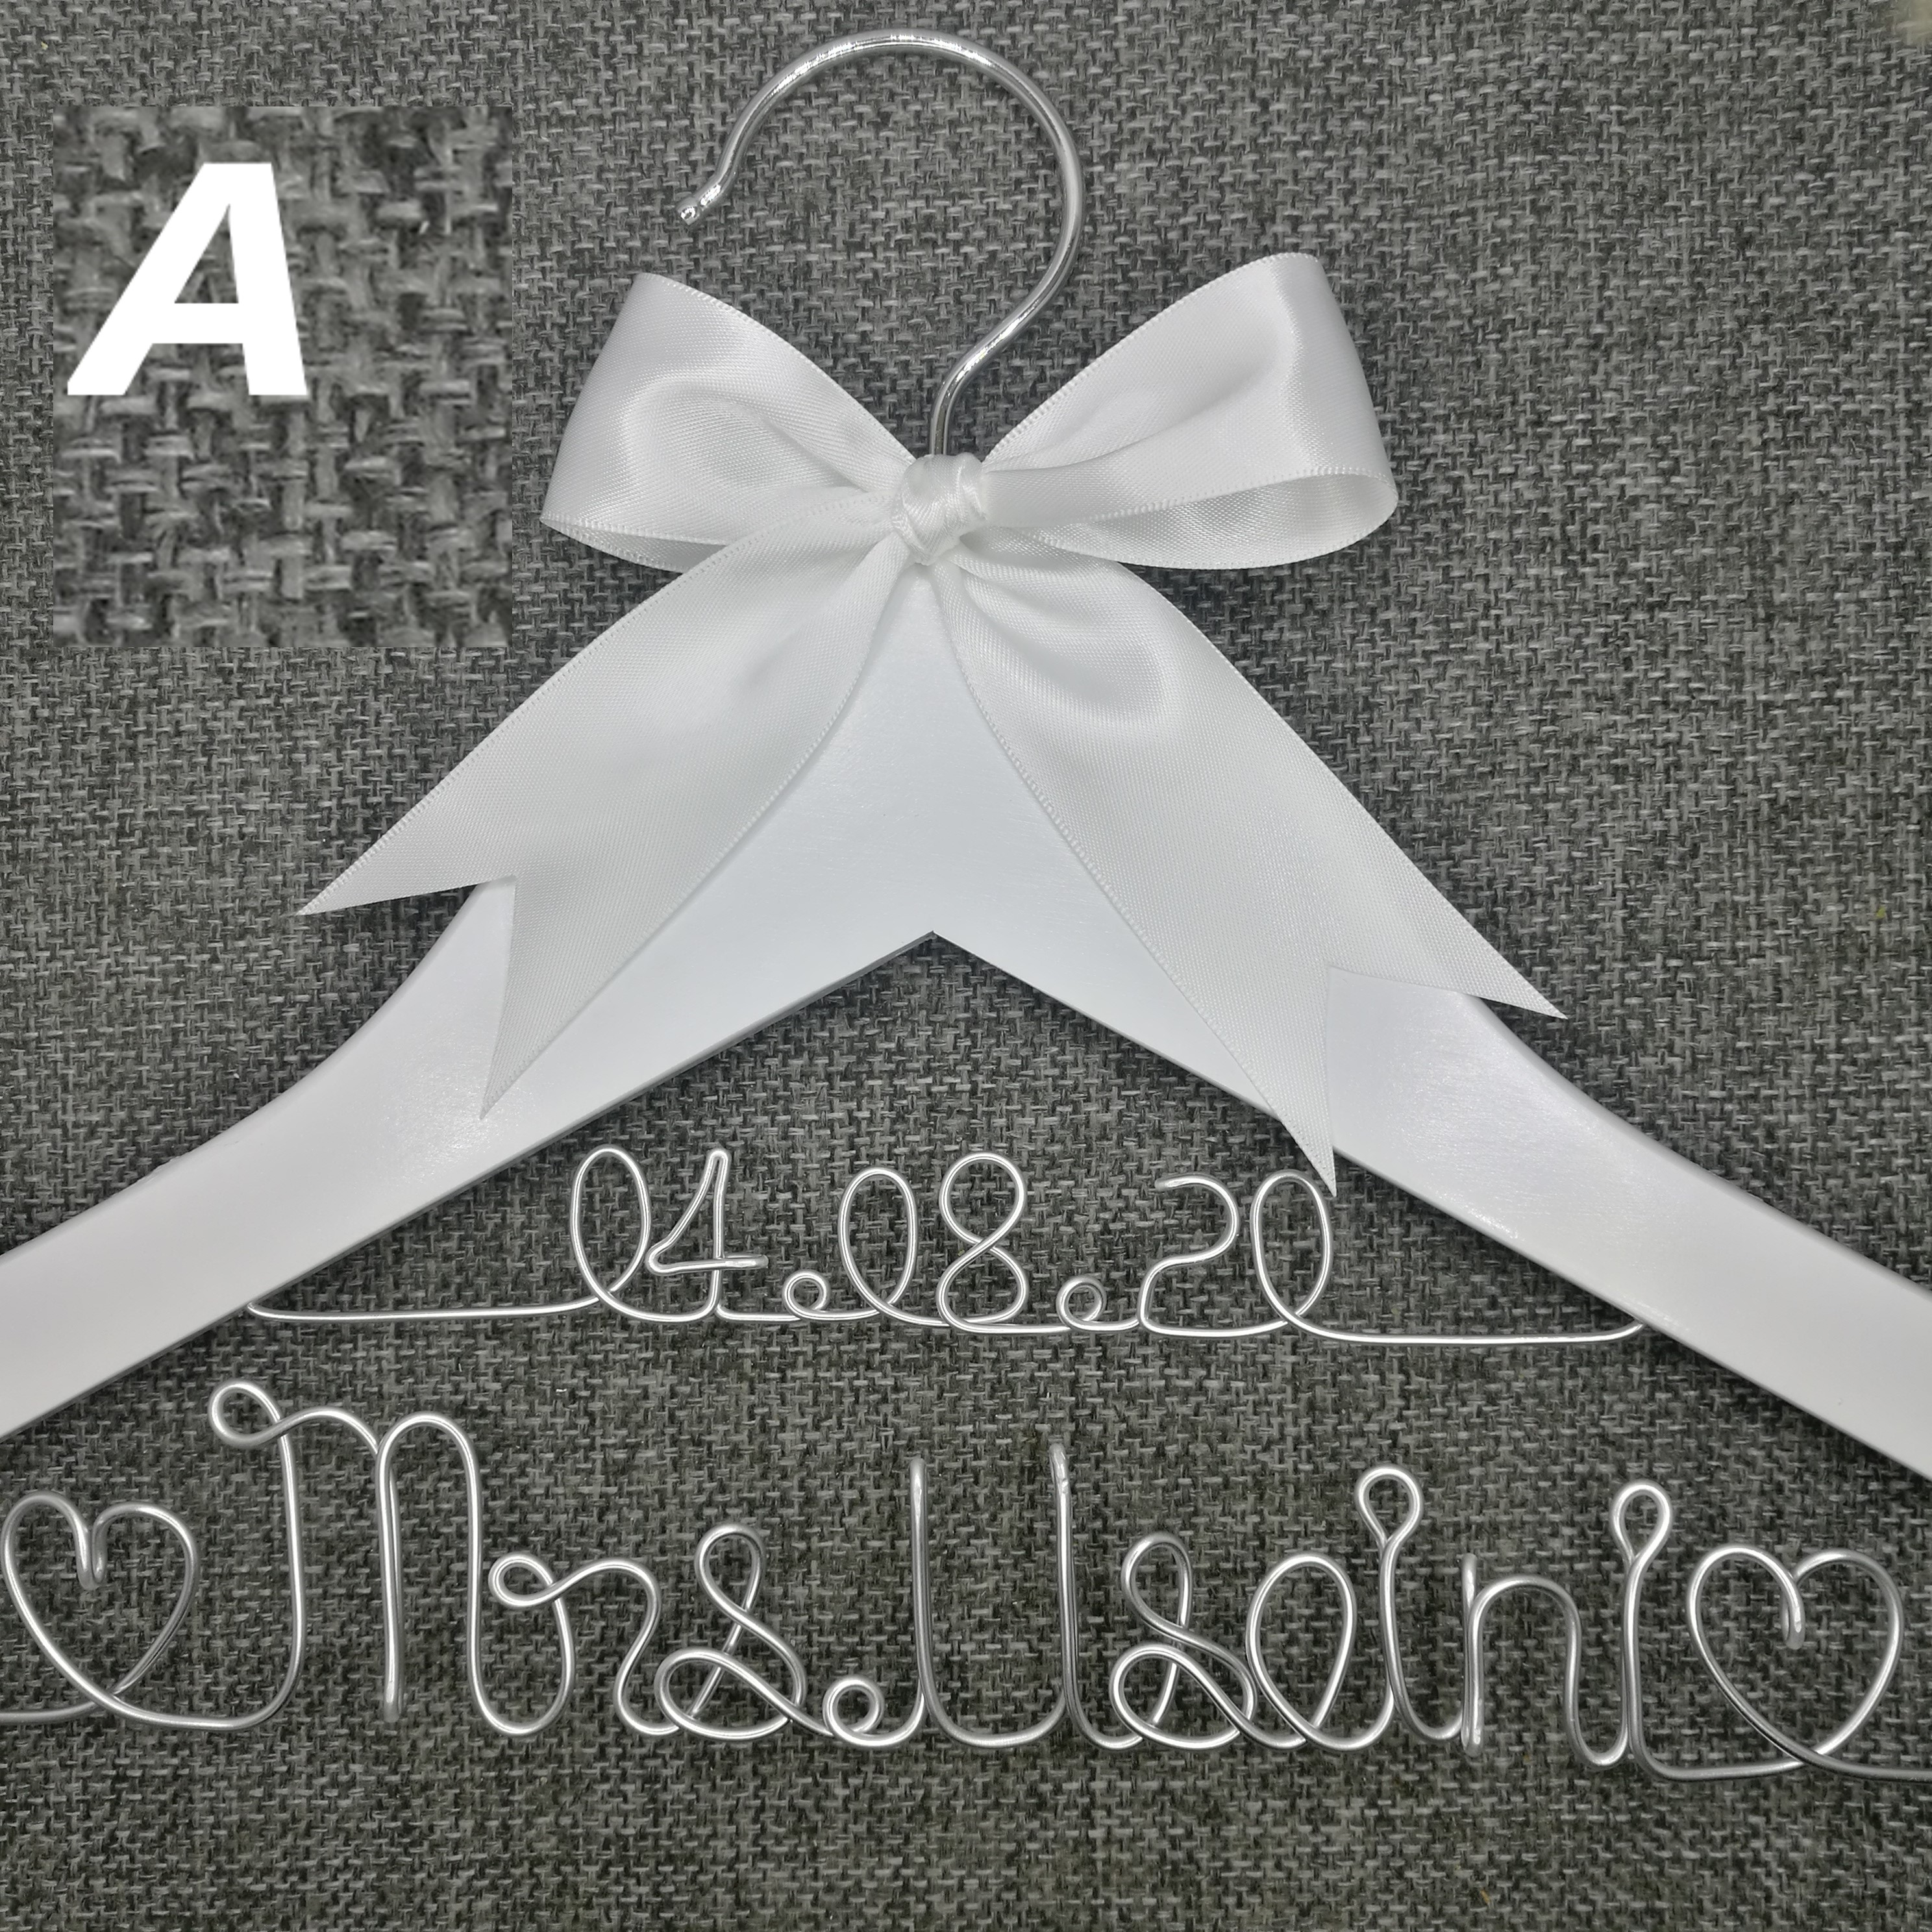 Personalized Wedding Hanger, Bridesmaid Gifts, Name Hanger, Brides Hanger Custom Bridal Gift White Hanger